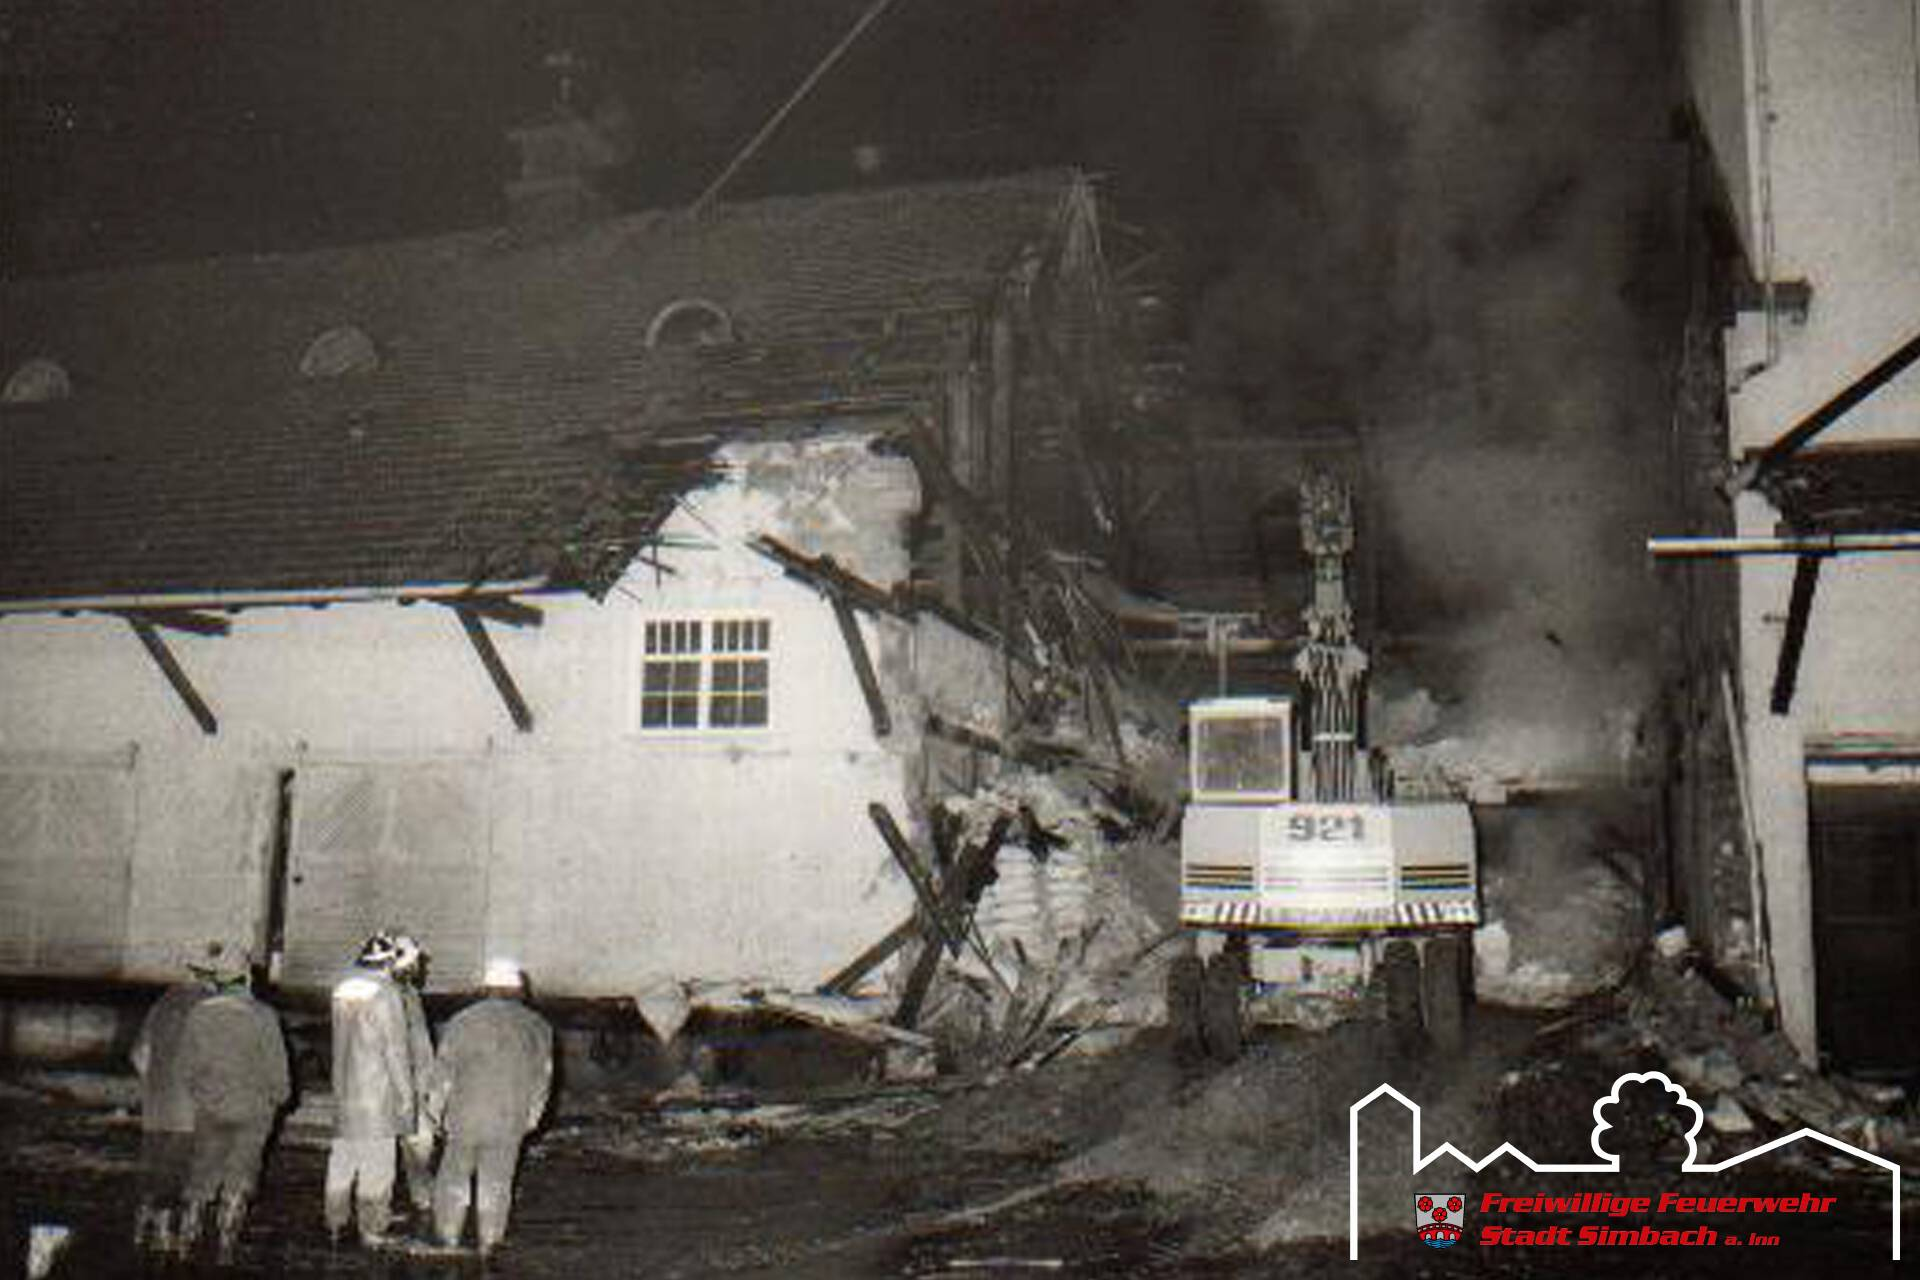 Brand Lagerhaus Oberlechner 12.12.1980 (9)